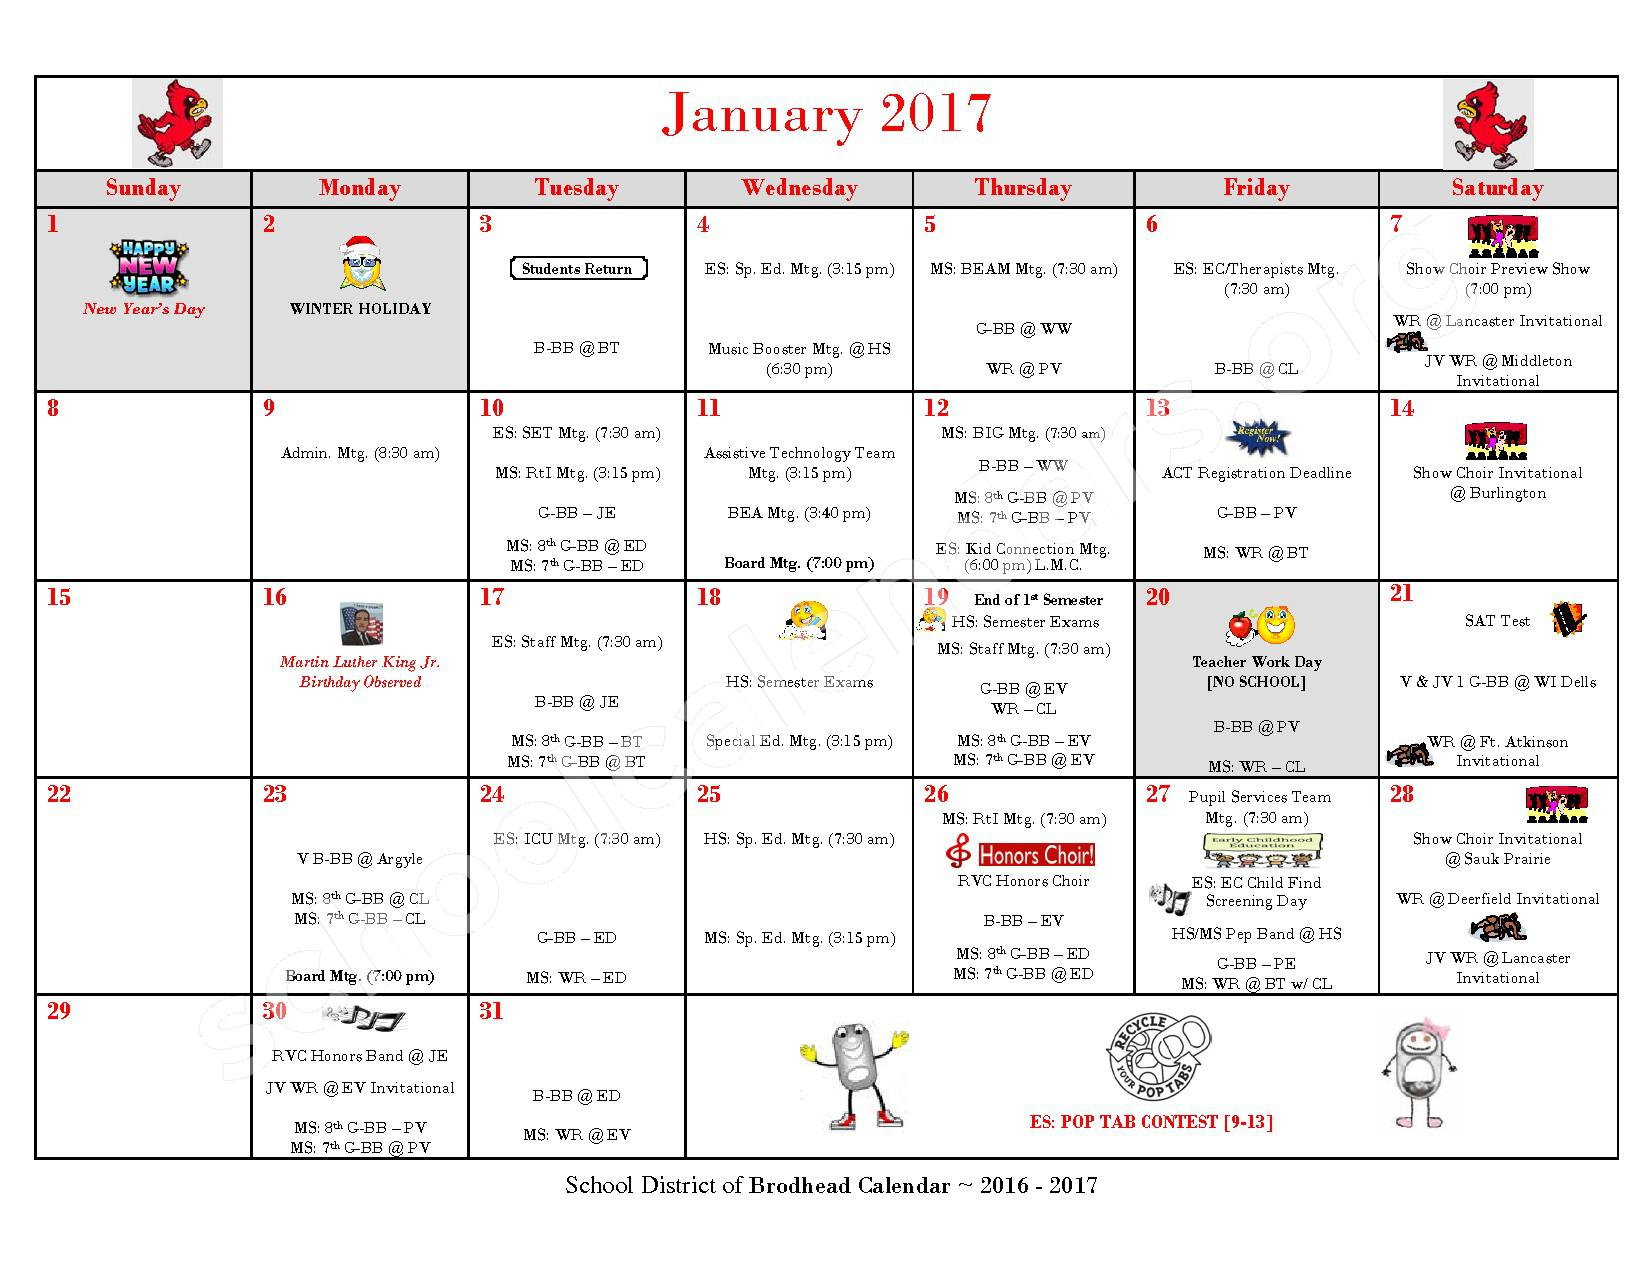 2016 - 2017 School Calendar – Brodhead School District – page 6